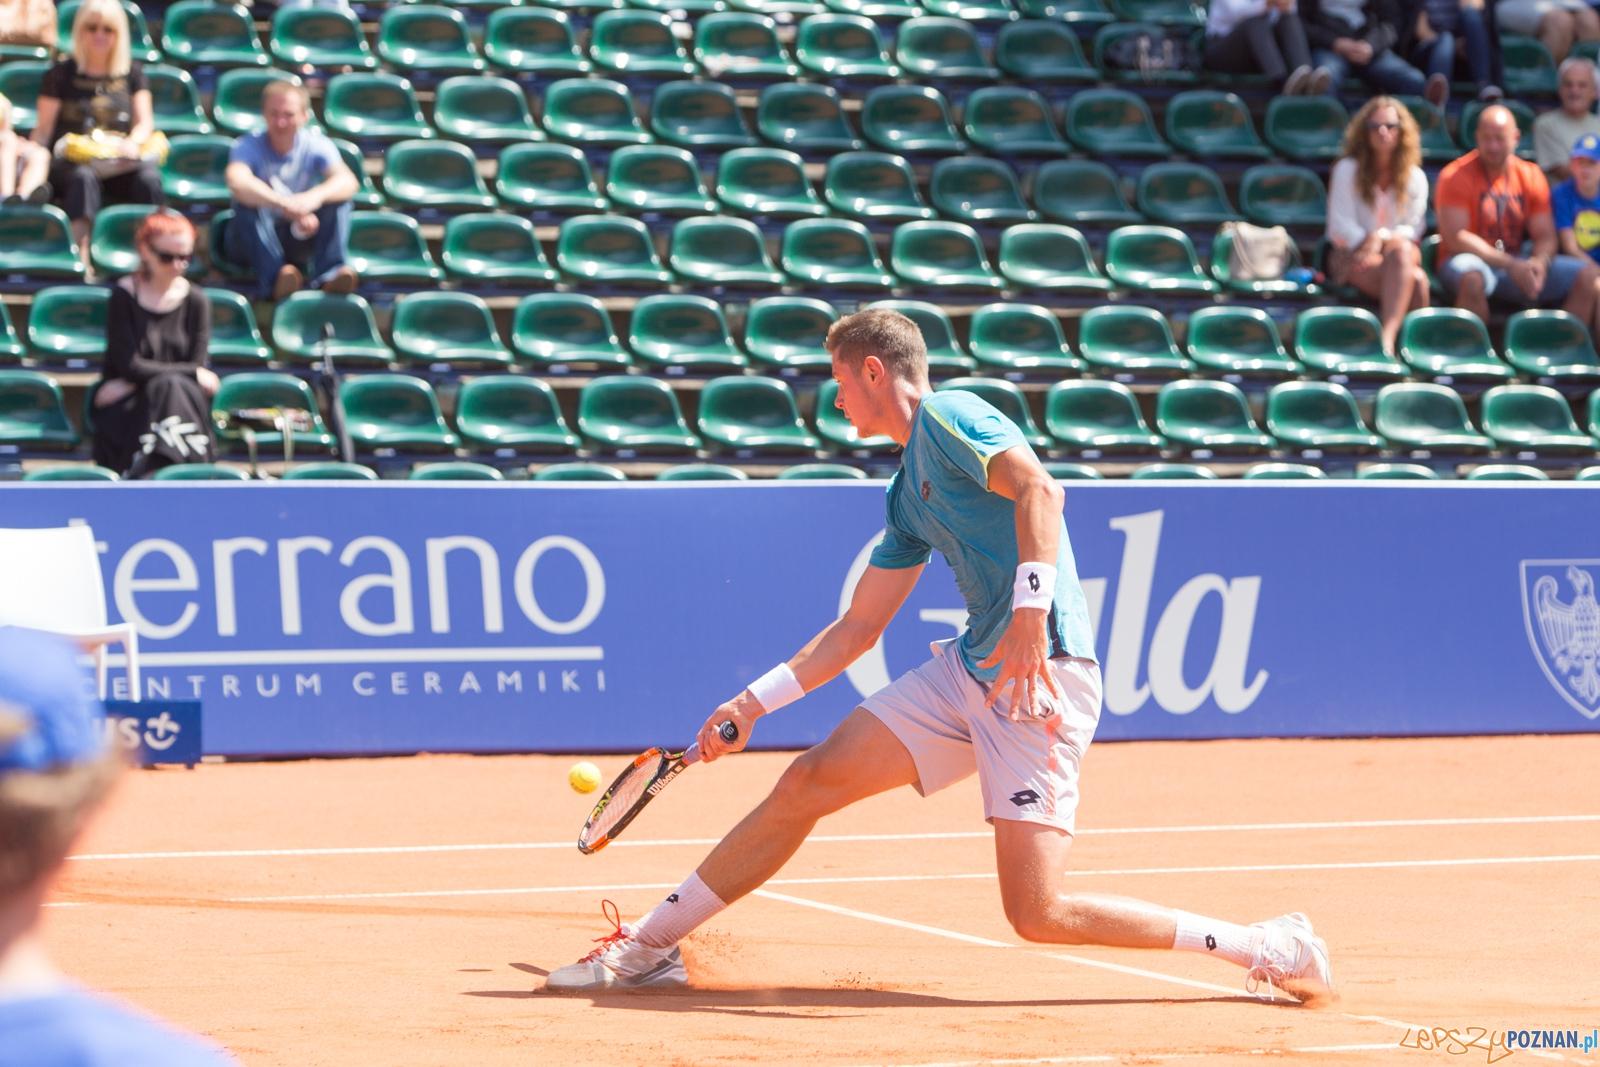 Poznań Open 2016: Maxime Janvier vs Marcin Gawron  Foto: lepszyPOZNAN.pl / Piotr Rychter